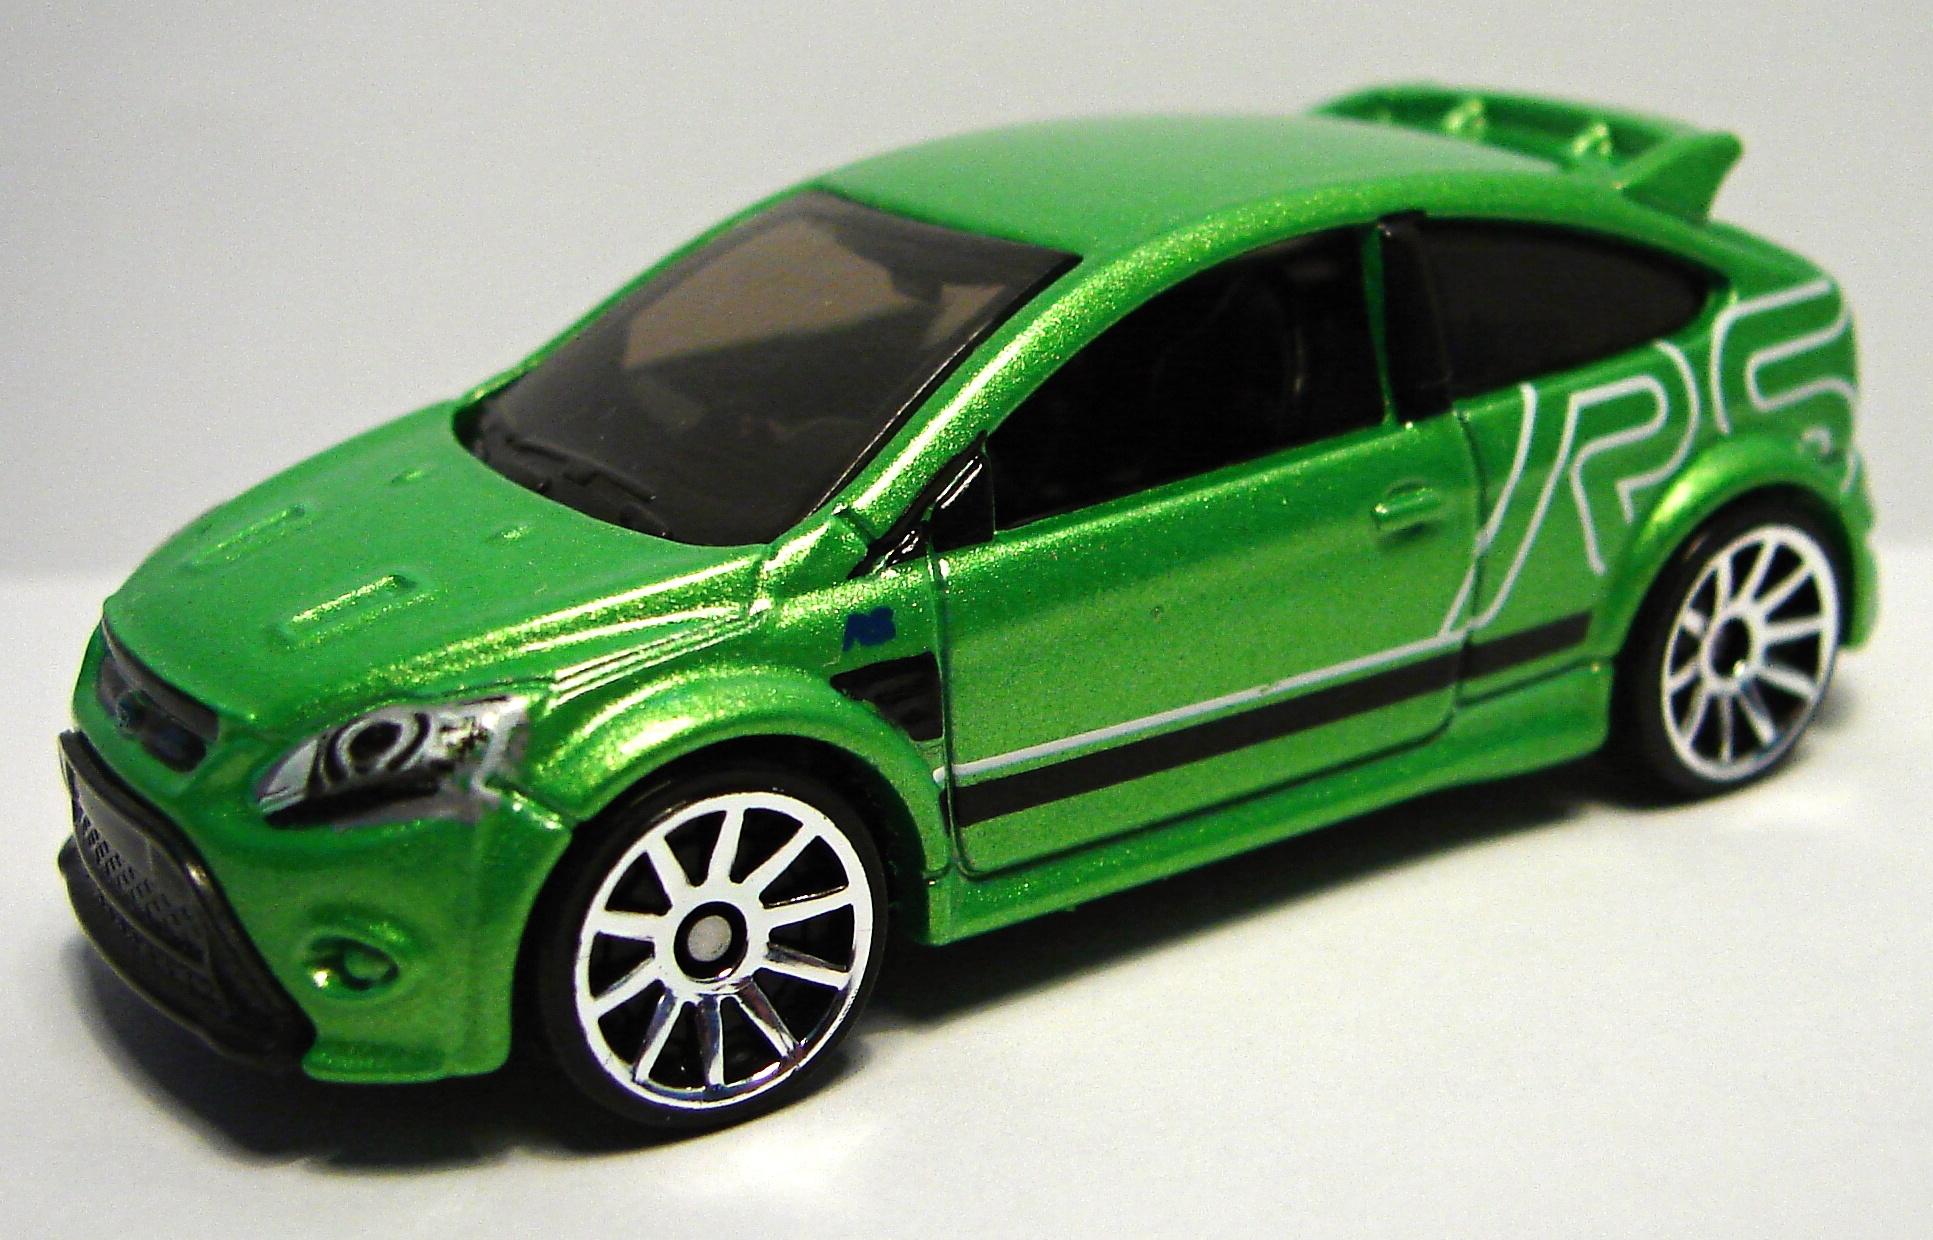 Ford Focus Wheel Upcomingcarshqcom